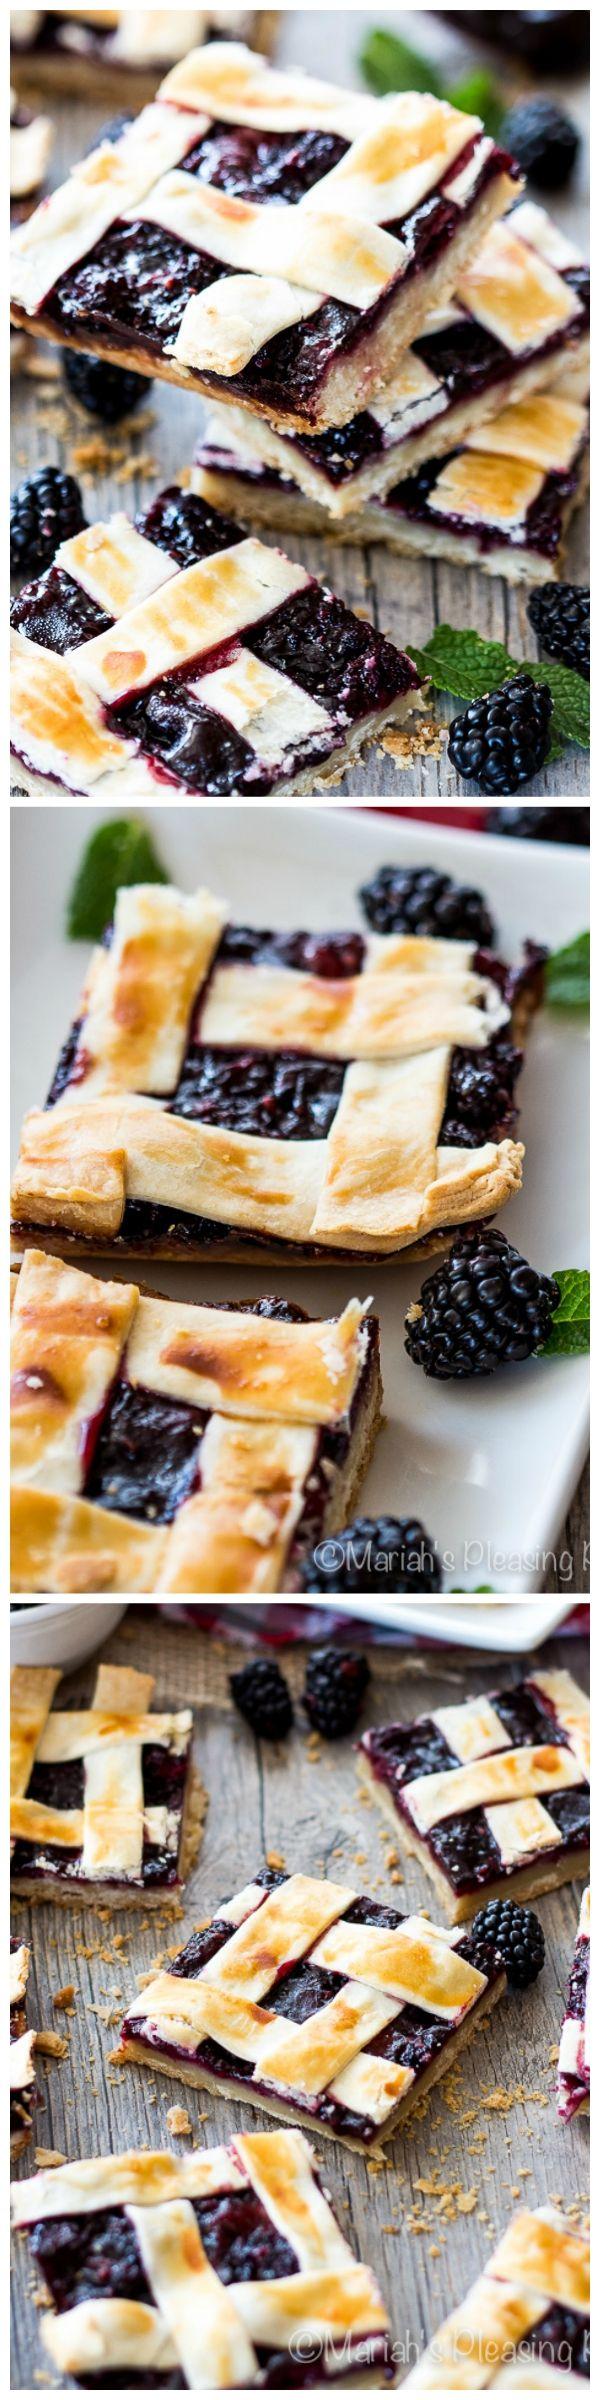 Blackberry Pie Bars by mariahspleasingplates via wholeyum #Pie_Bars #Blackberry